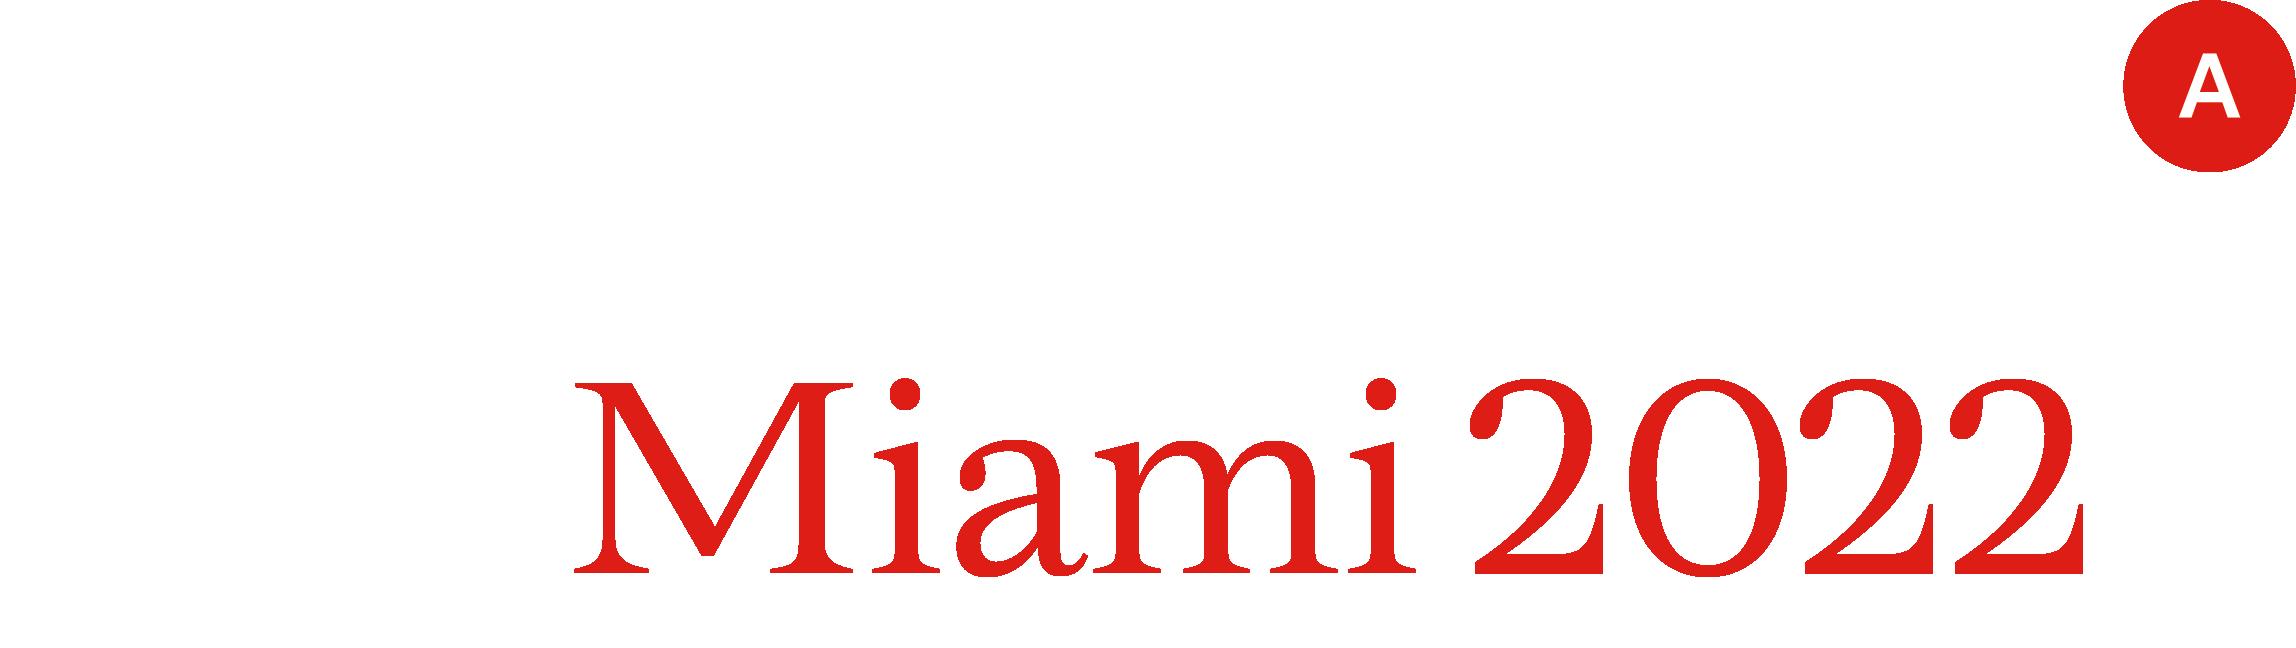 OffshoreAlert Miami 2022